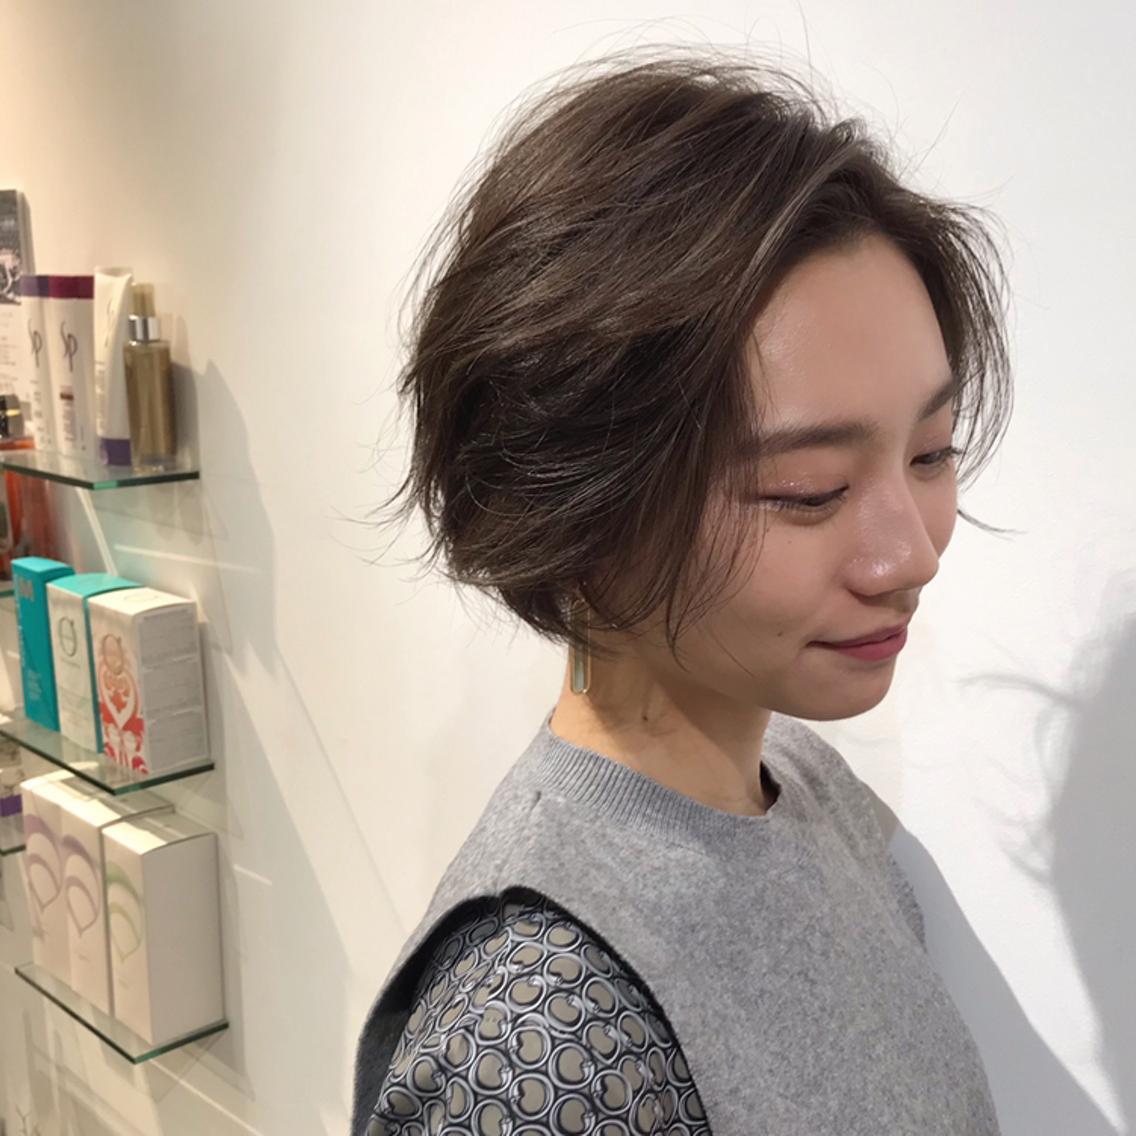 MAISON deIGGY所属・萩原直人の掲載